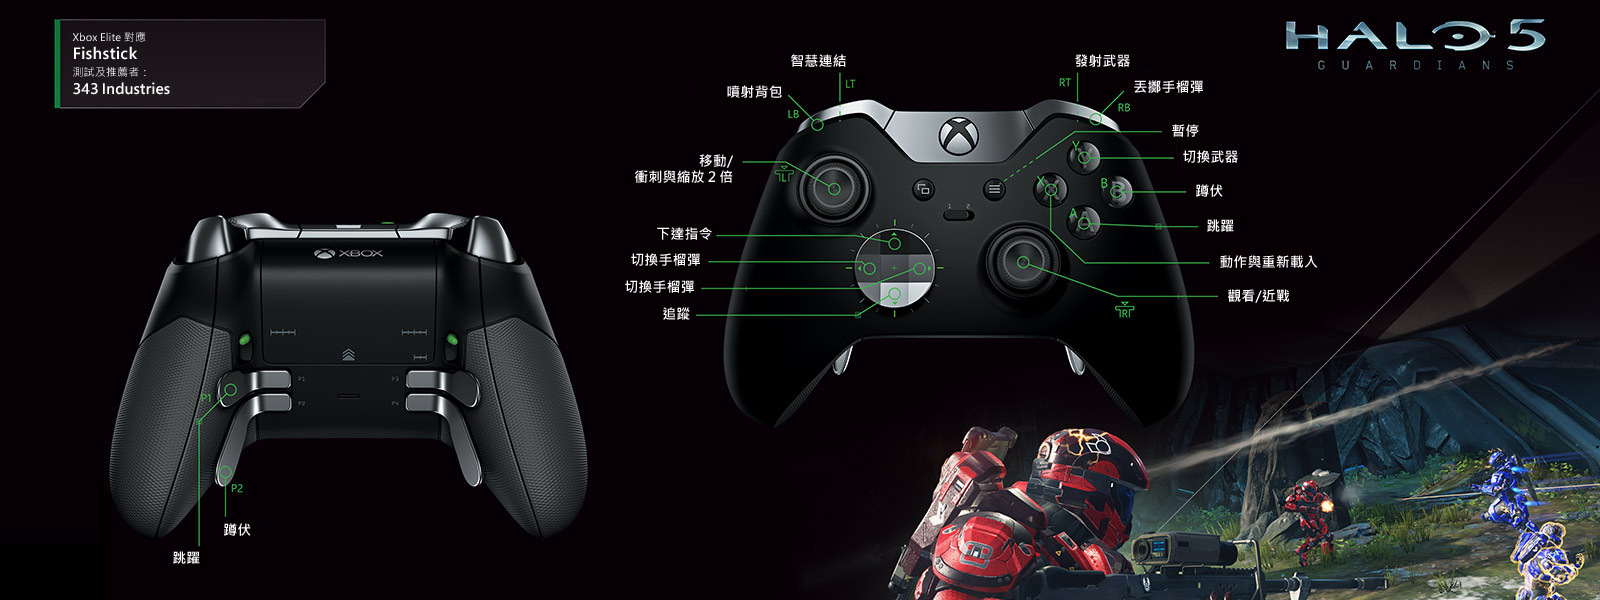 Halo 5 – Fishstick Elite 配對功能